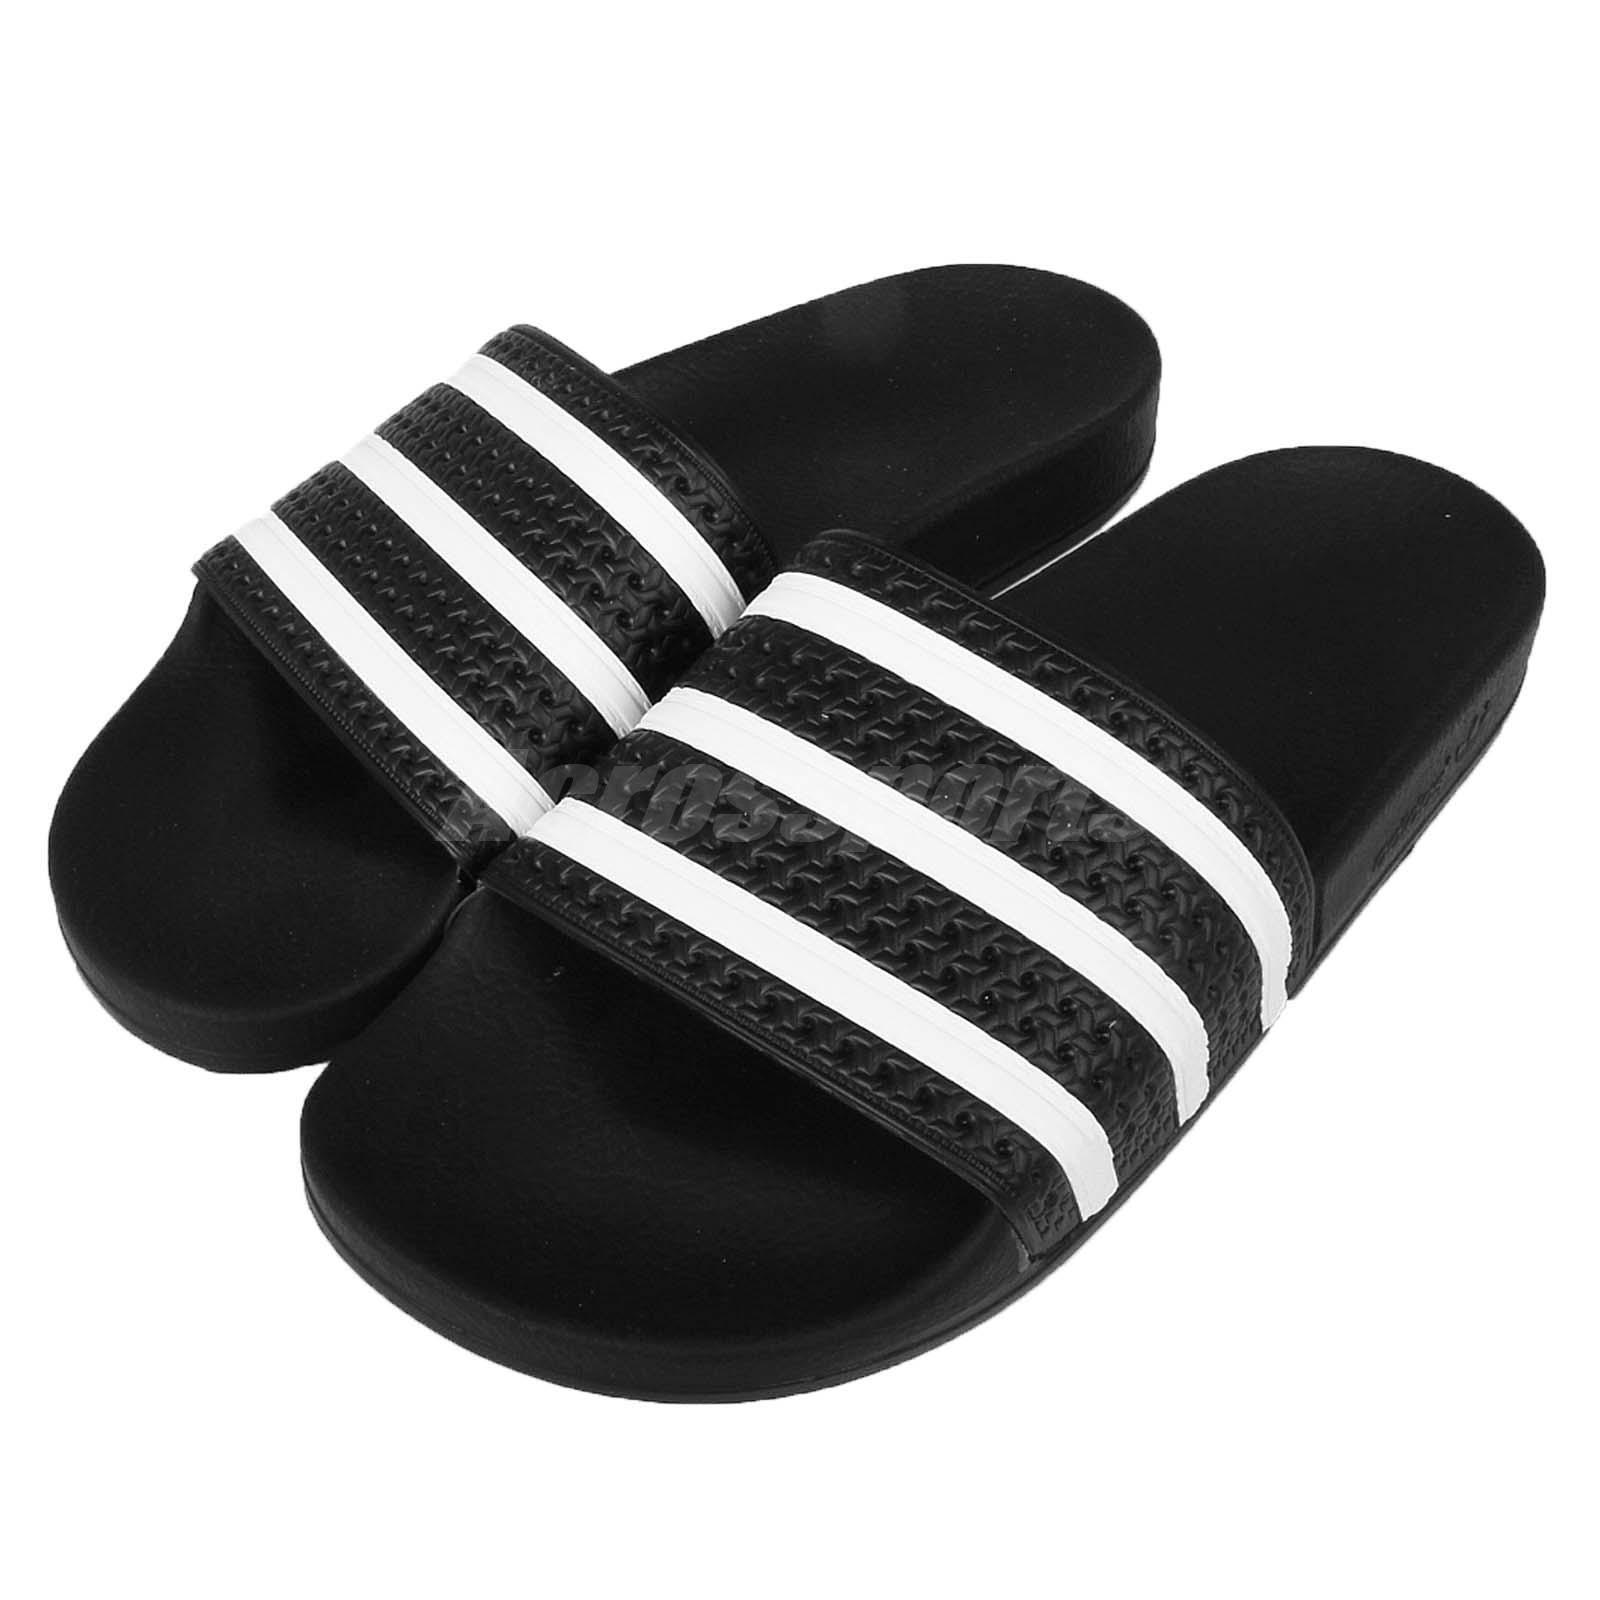 540a8afa3 adidas Adilette Black White Mens Slide Slippers Sandals 3-stripes ...